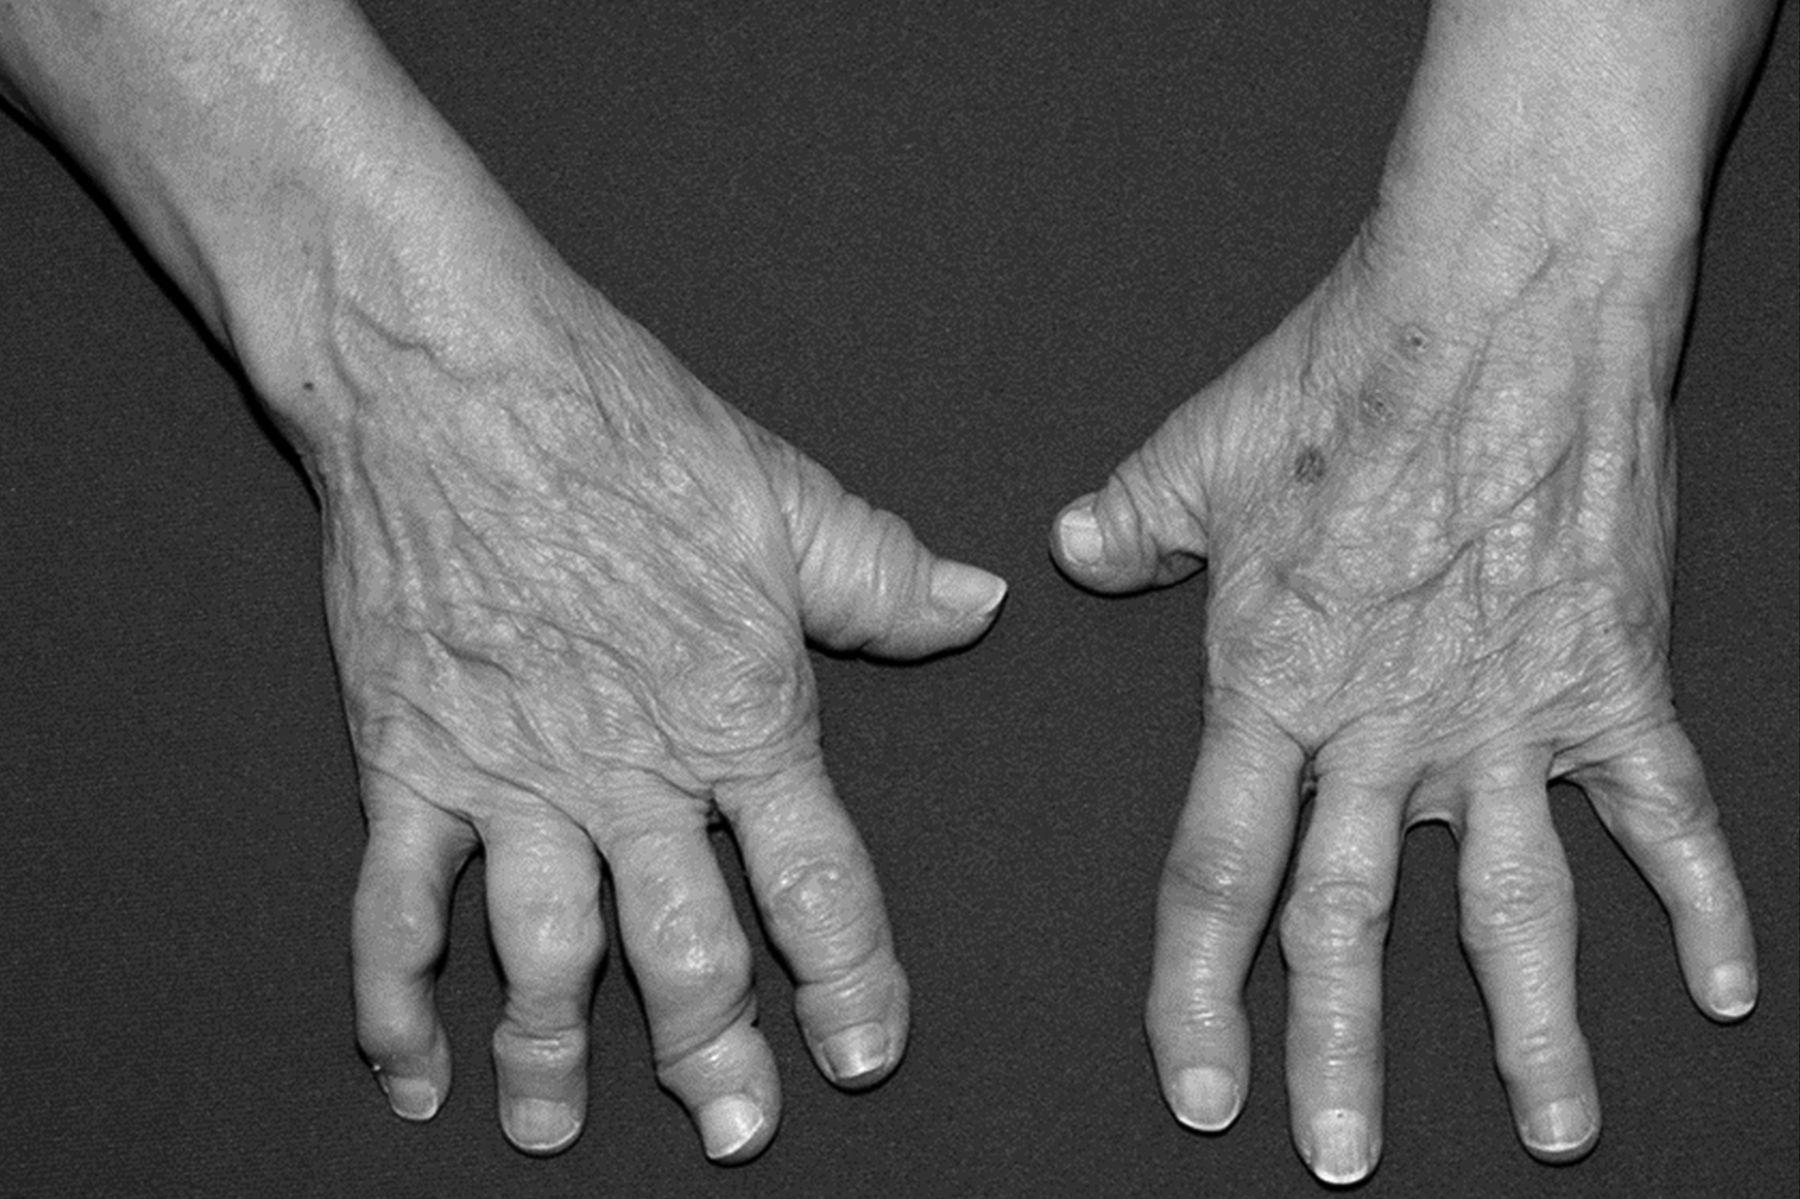 Idiopathic Arthritis Mutilans